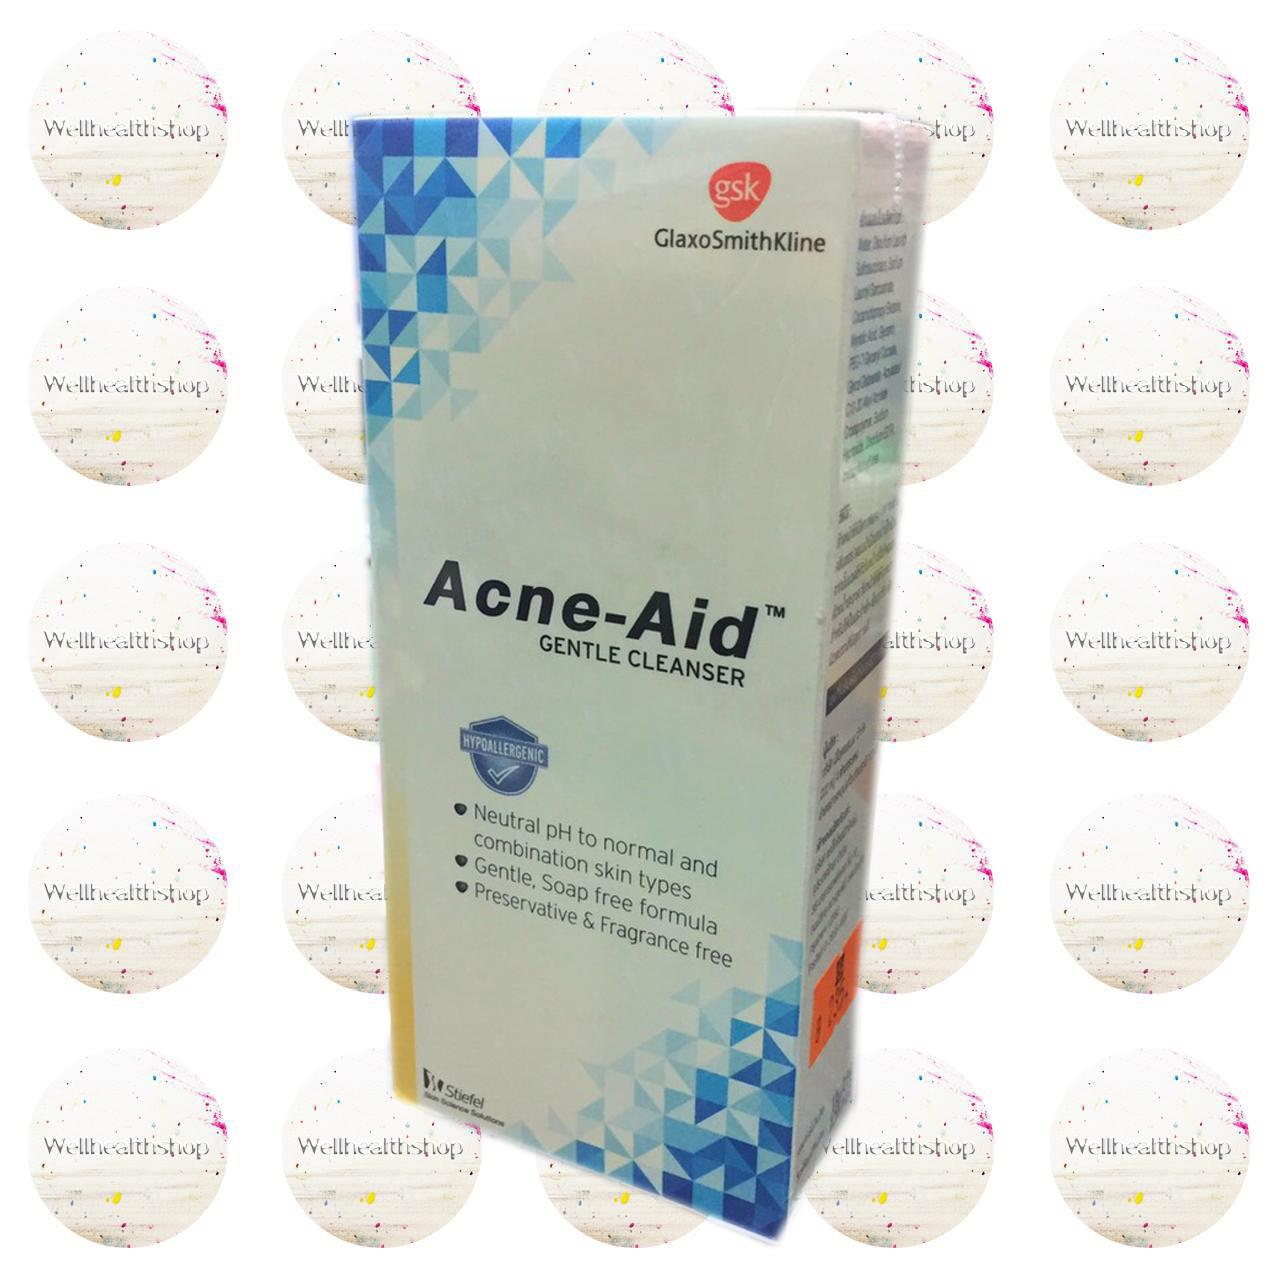 Acne-Aid Gentle Cleanser แอคเน่ เอด เจนเทิ่ล คลีนเซอร์